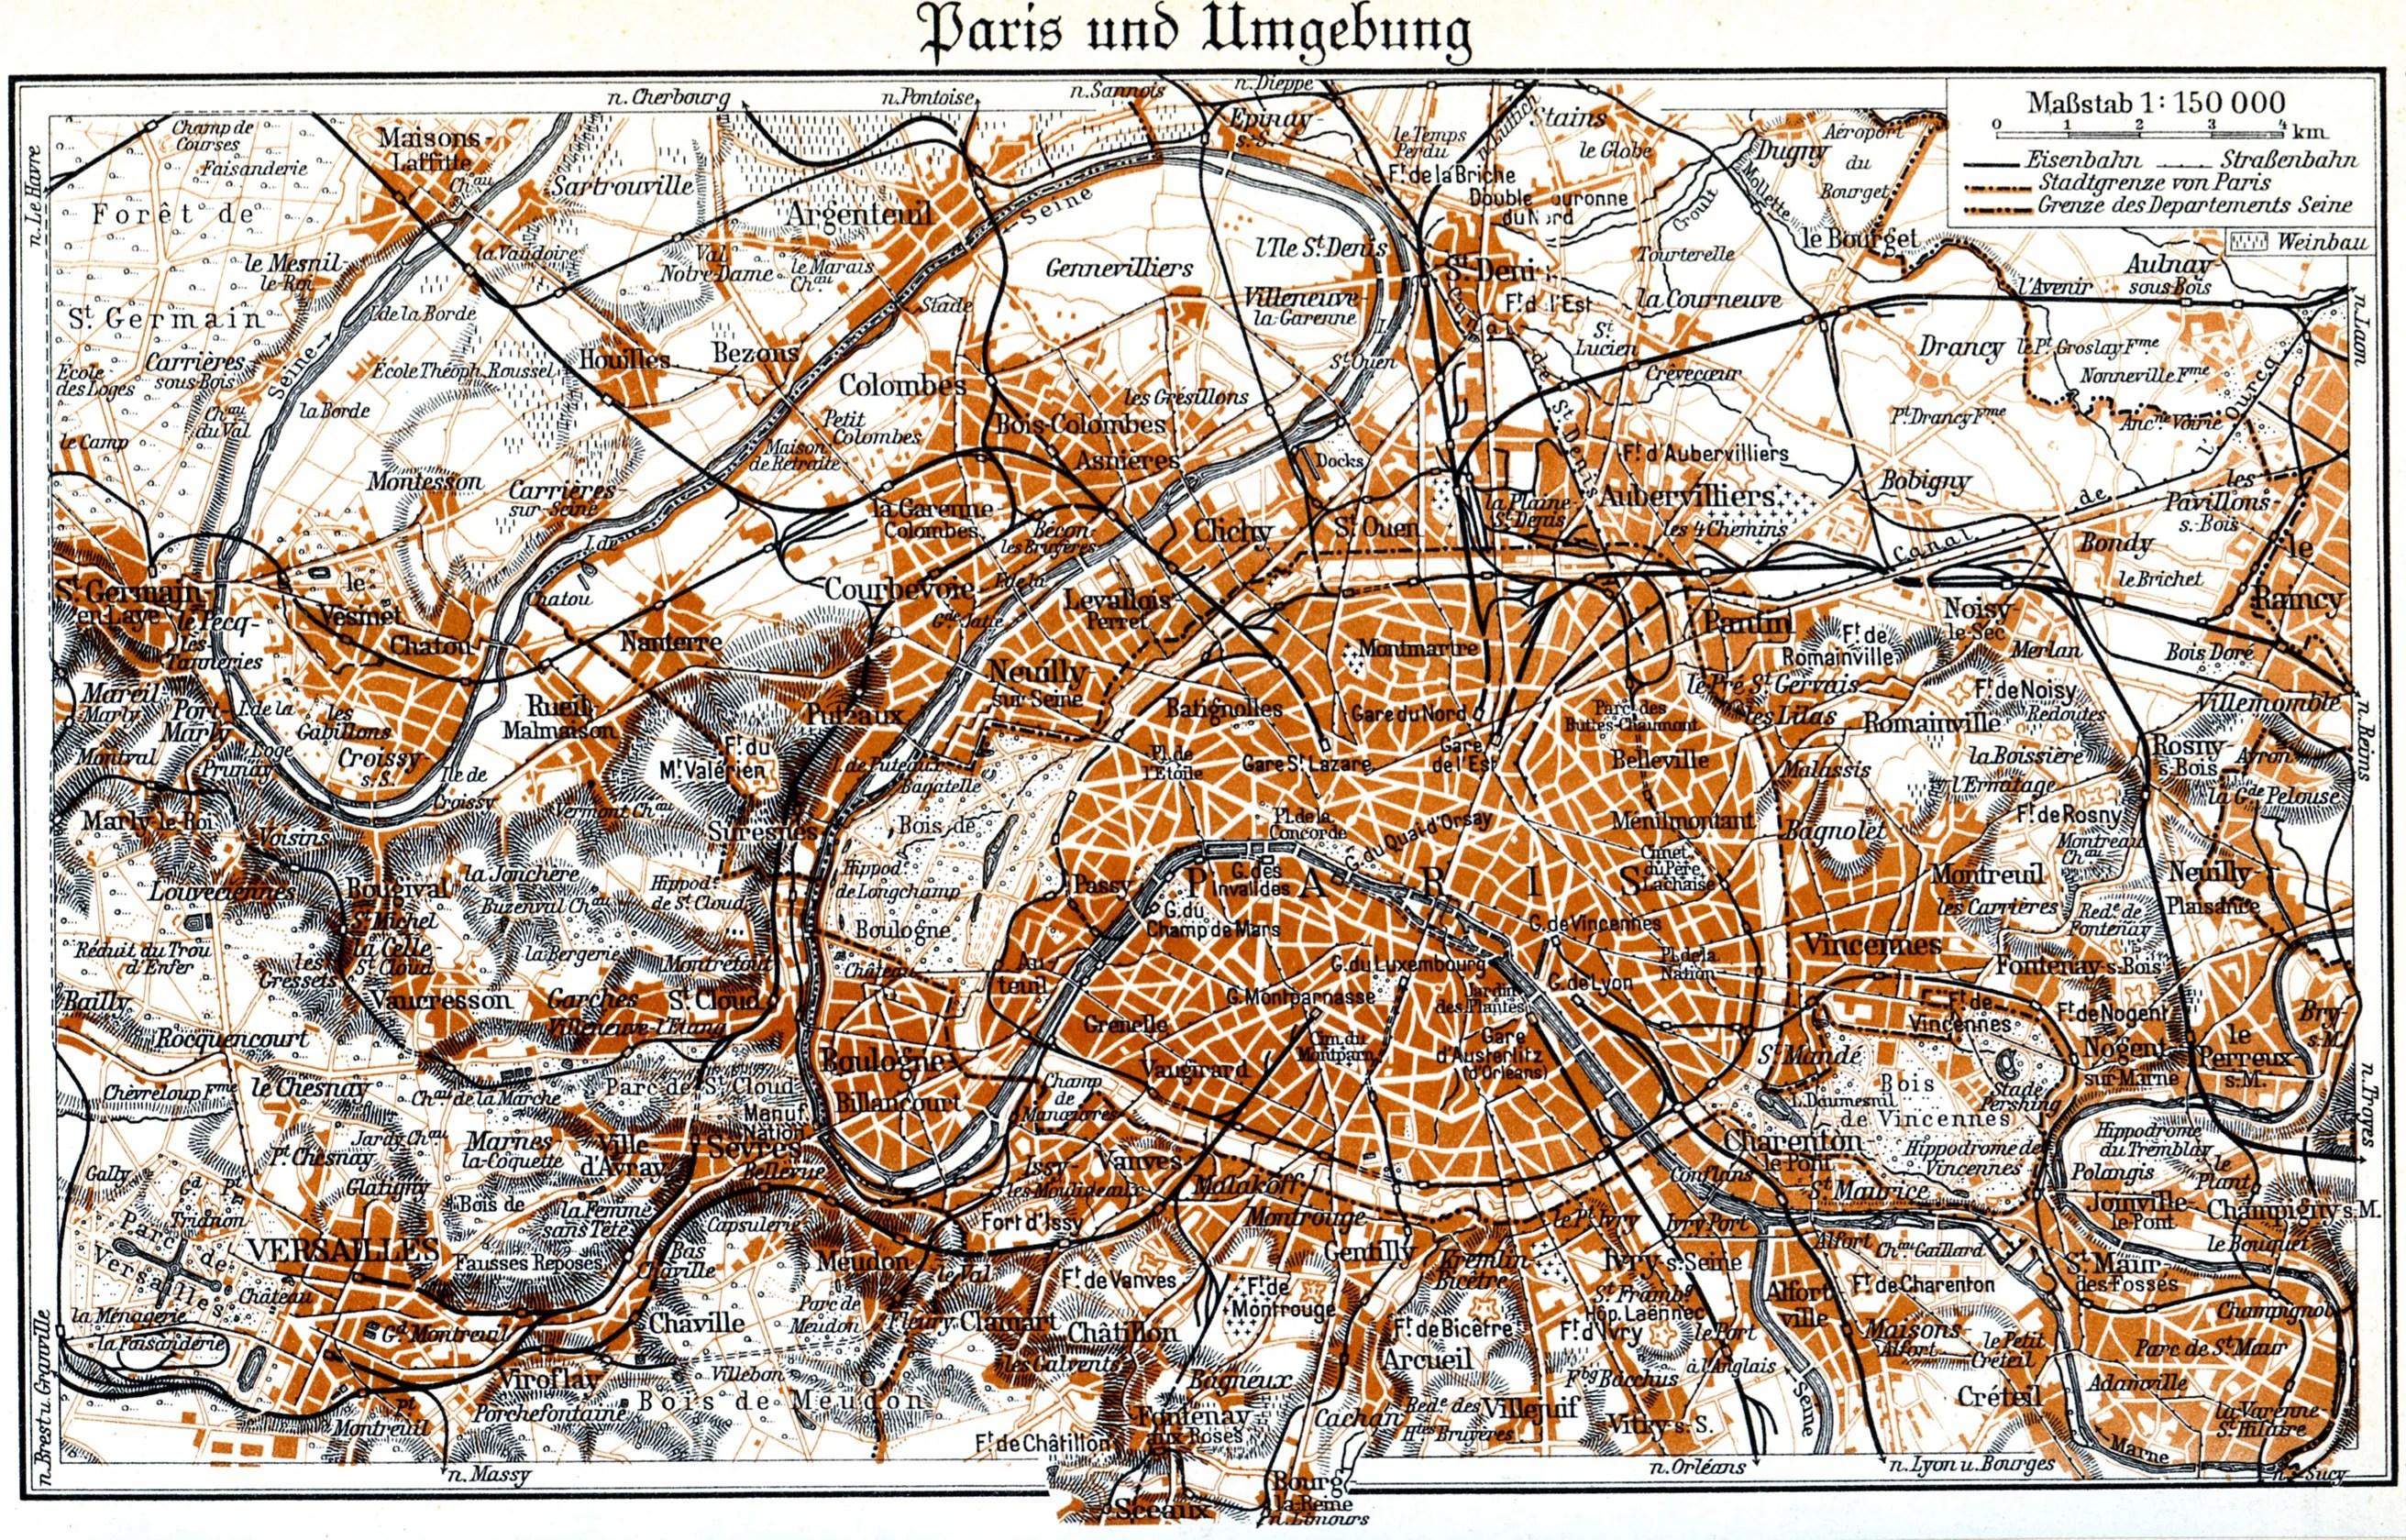 20 free vintage map printable images remodelaholiccom art printable maps